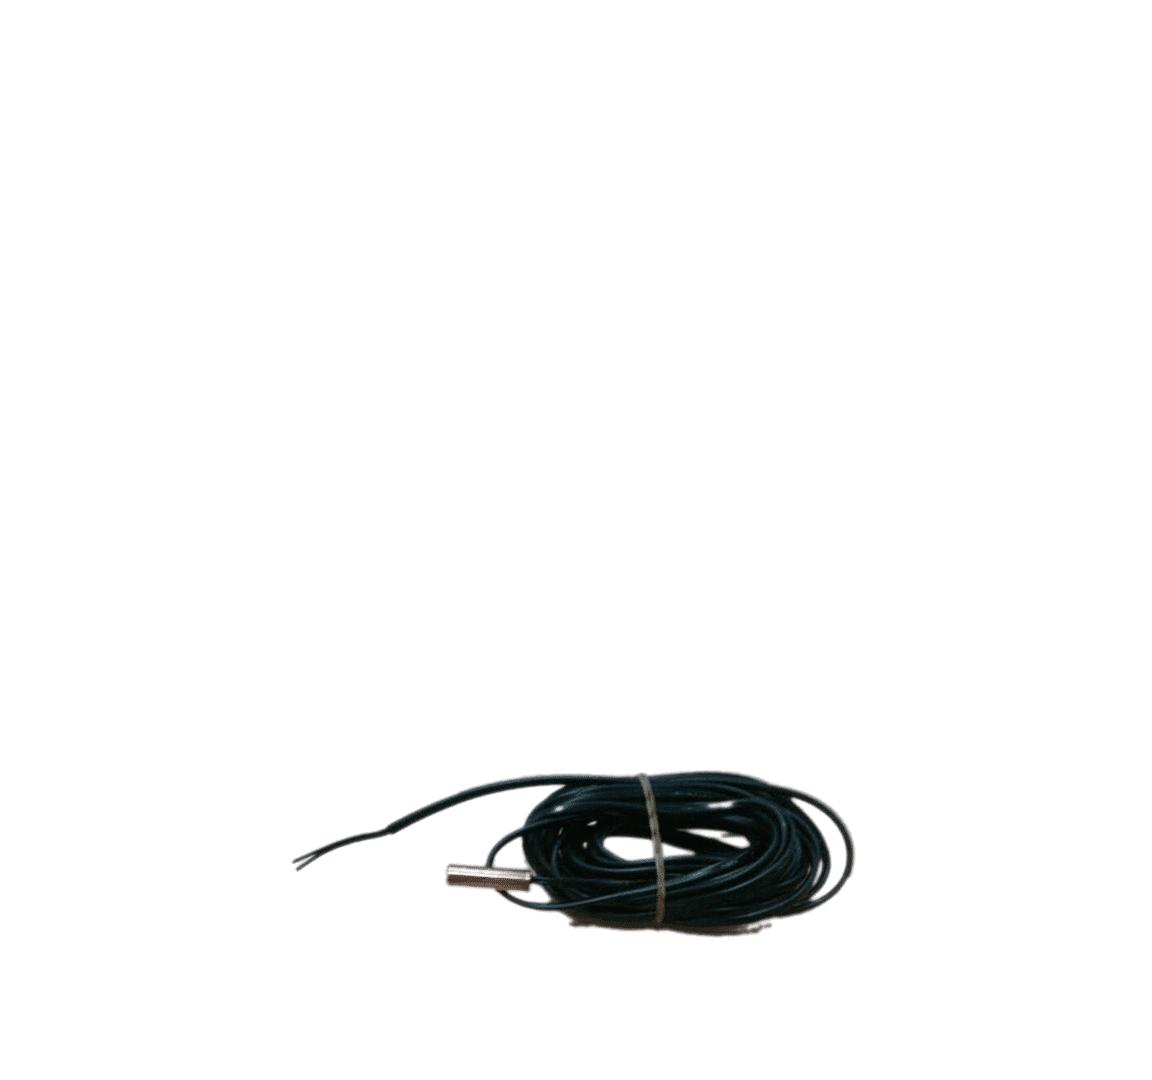 Tank sensor met 6m kabellengte en 6 mm diameter van DHPS